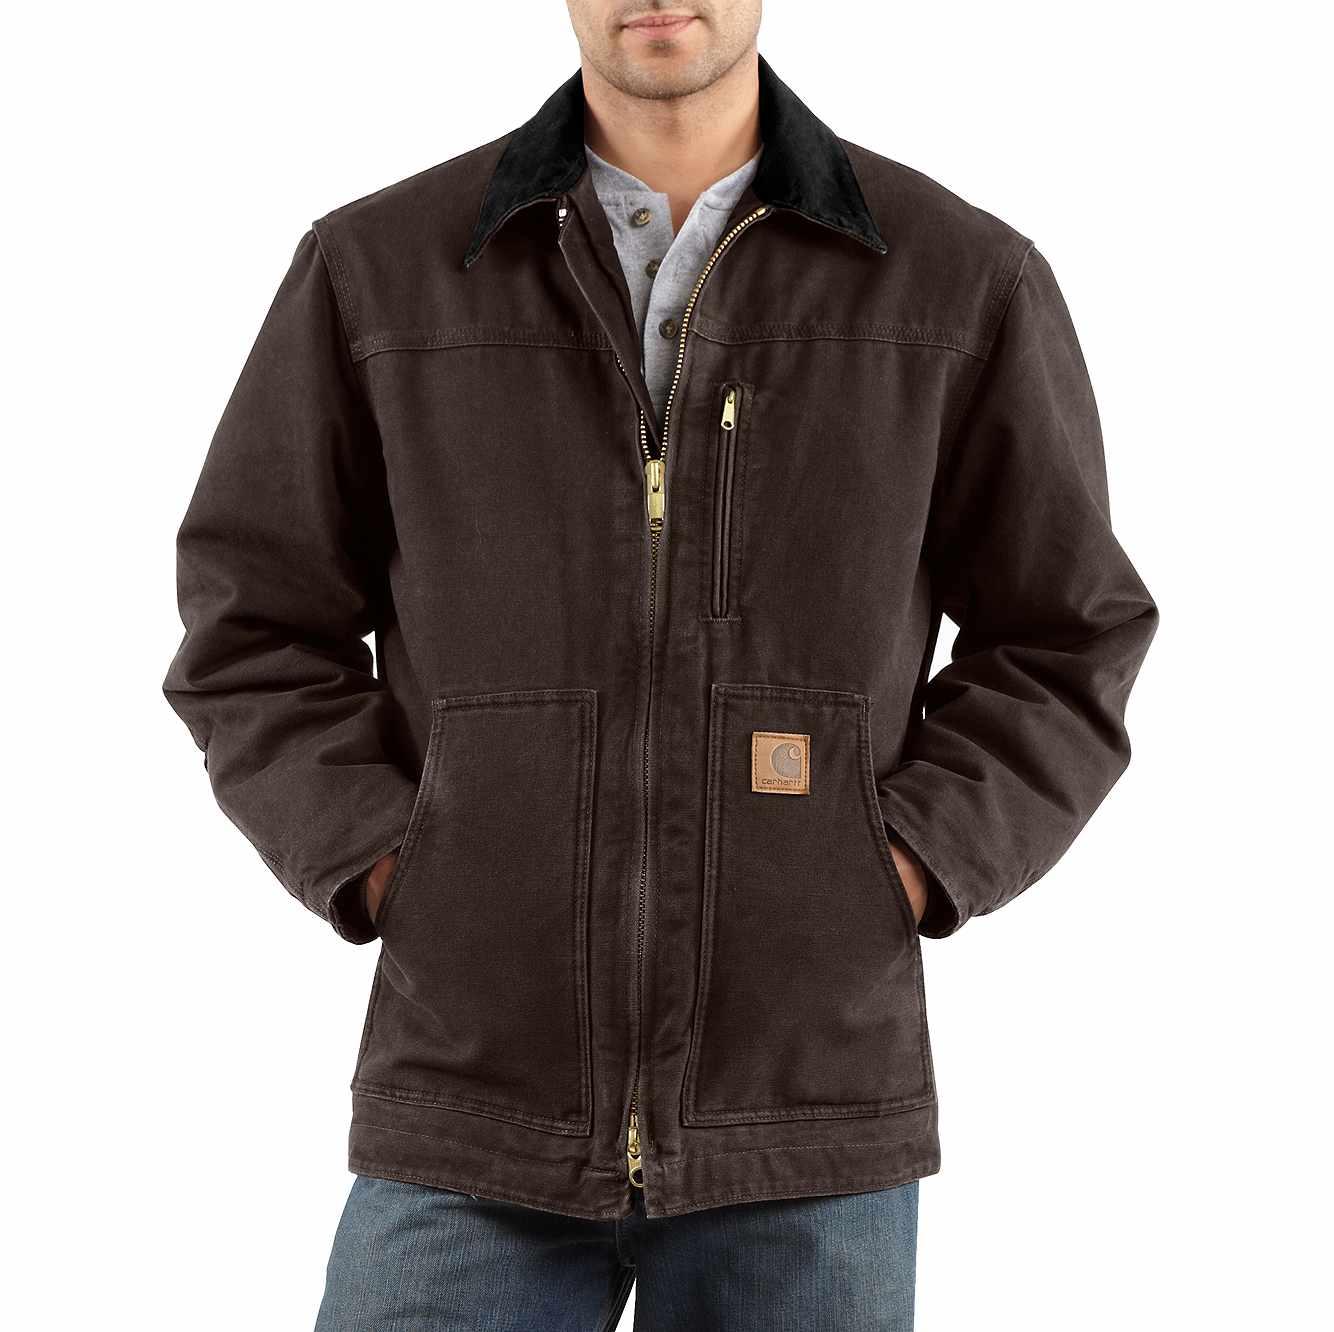 Carhartt Jacke Sandstone Traditional Jacket Black